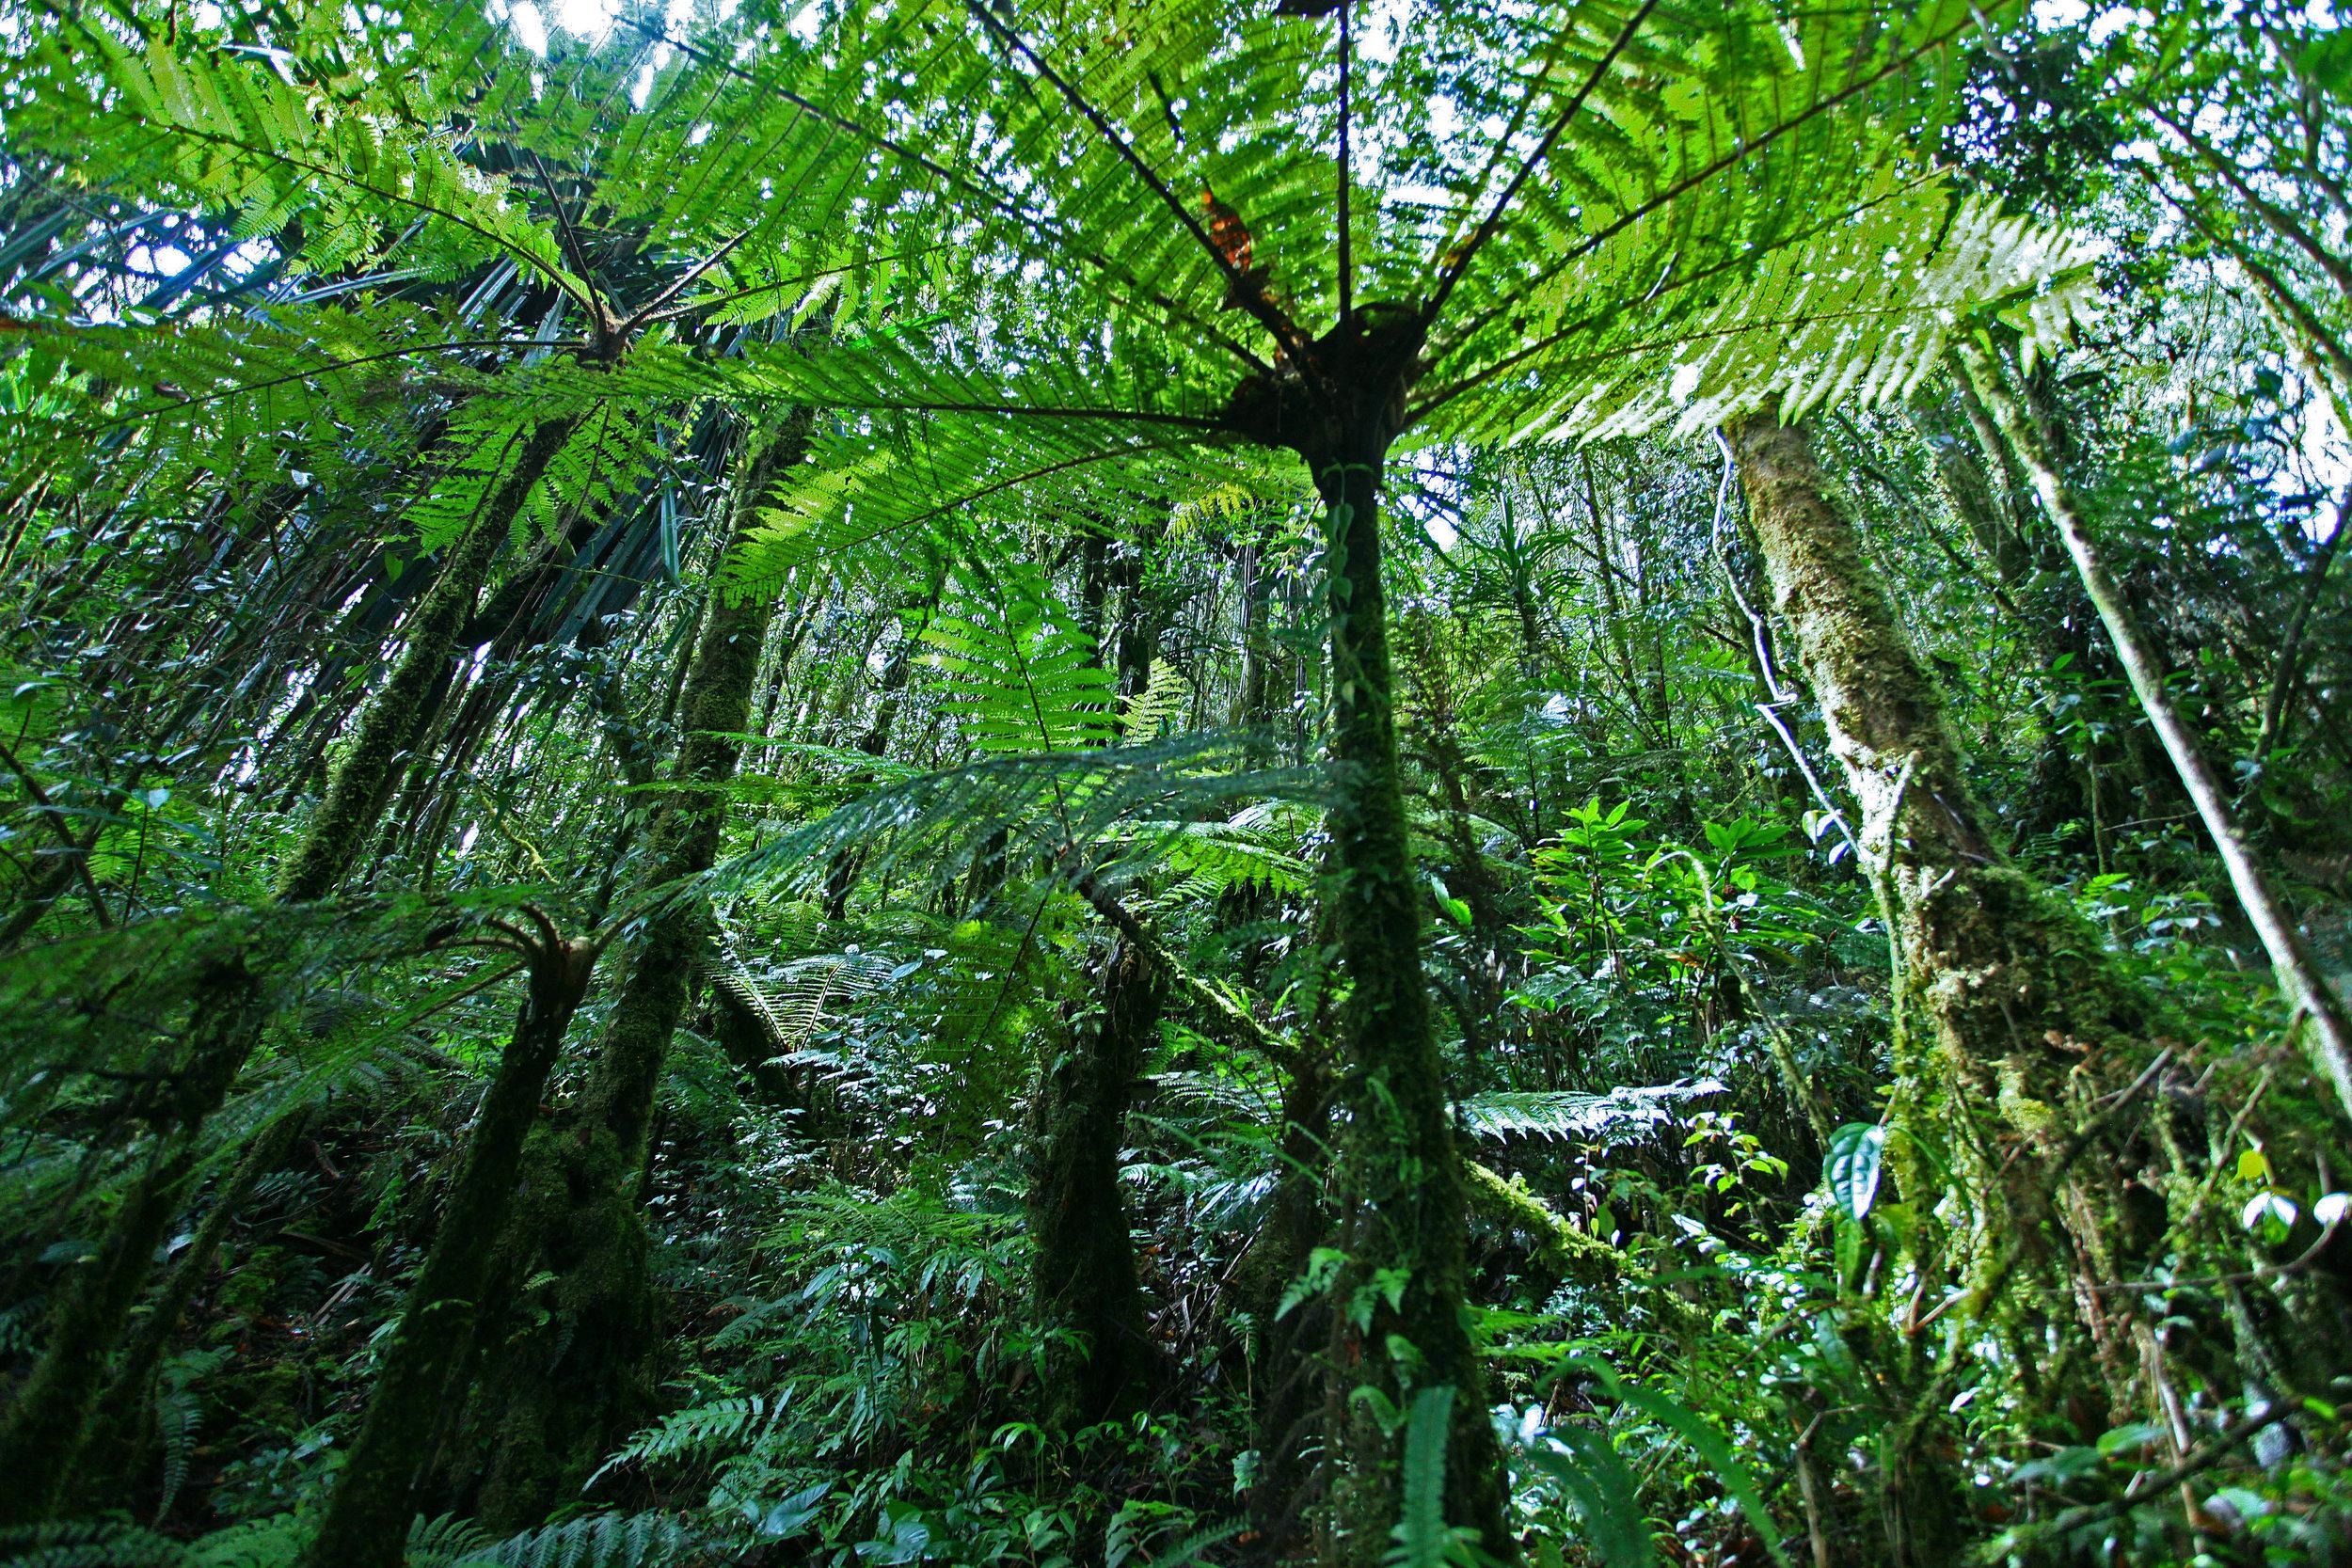 21_Cyathea_Papua_Rain_Forest_Papua-Indonesia.jpg